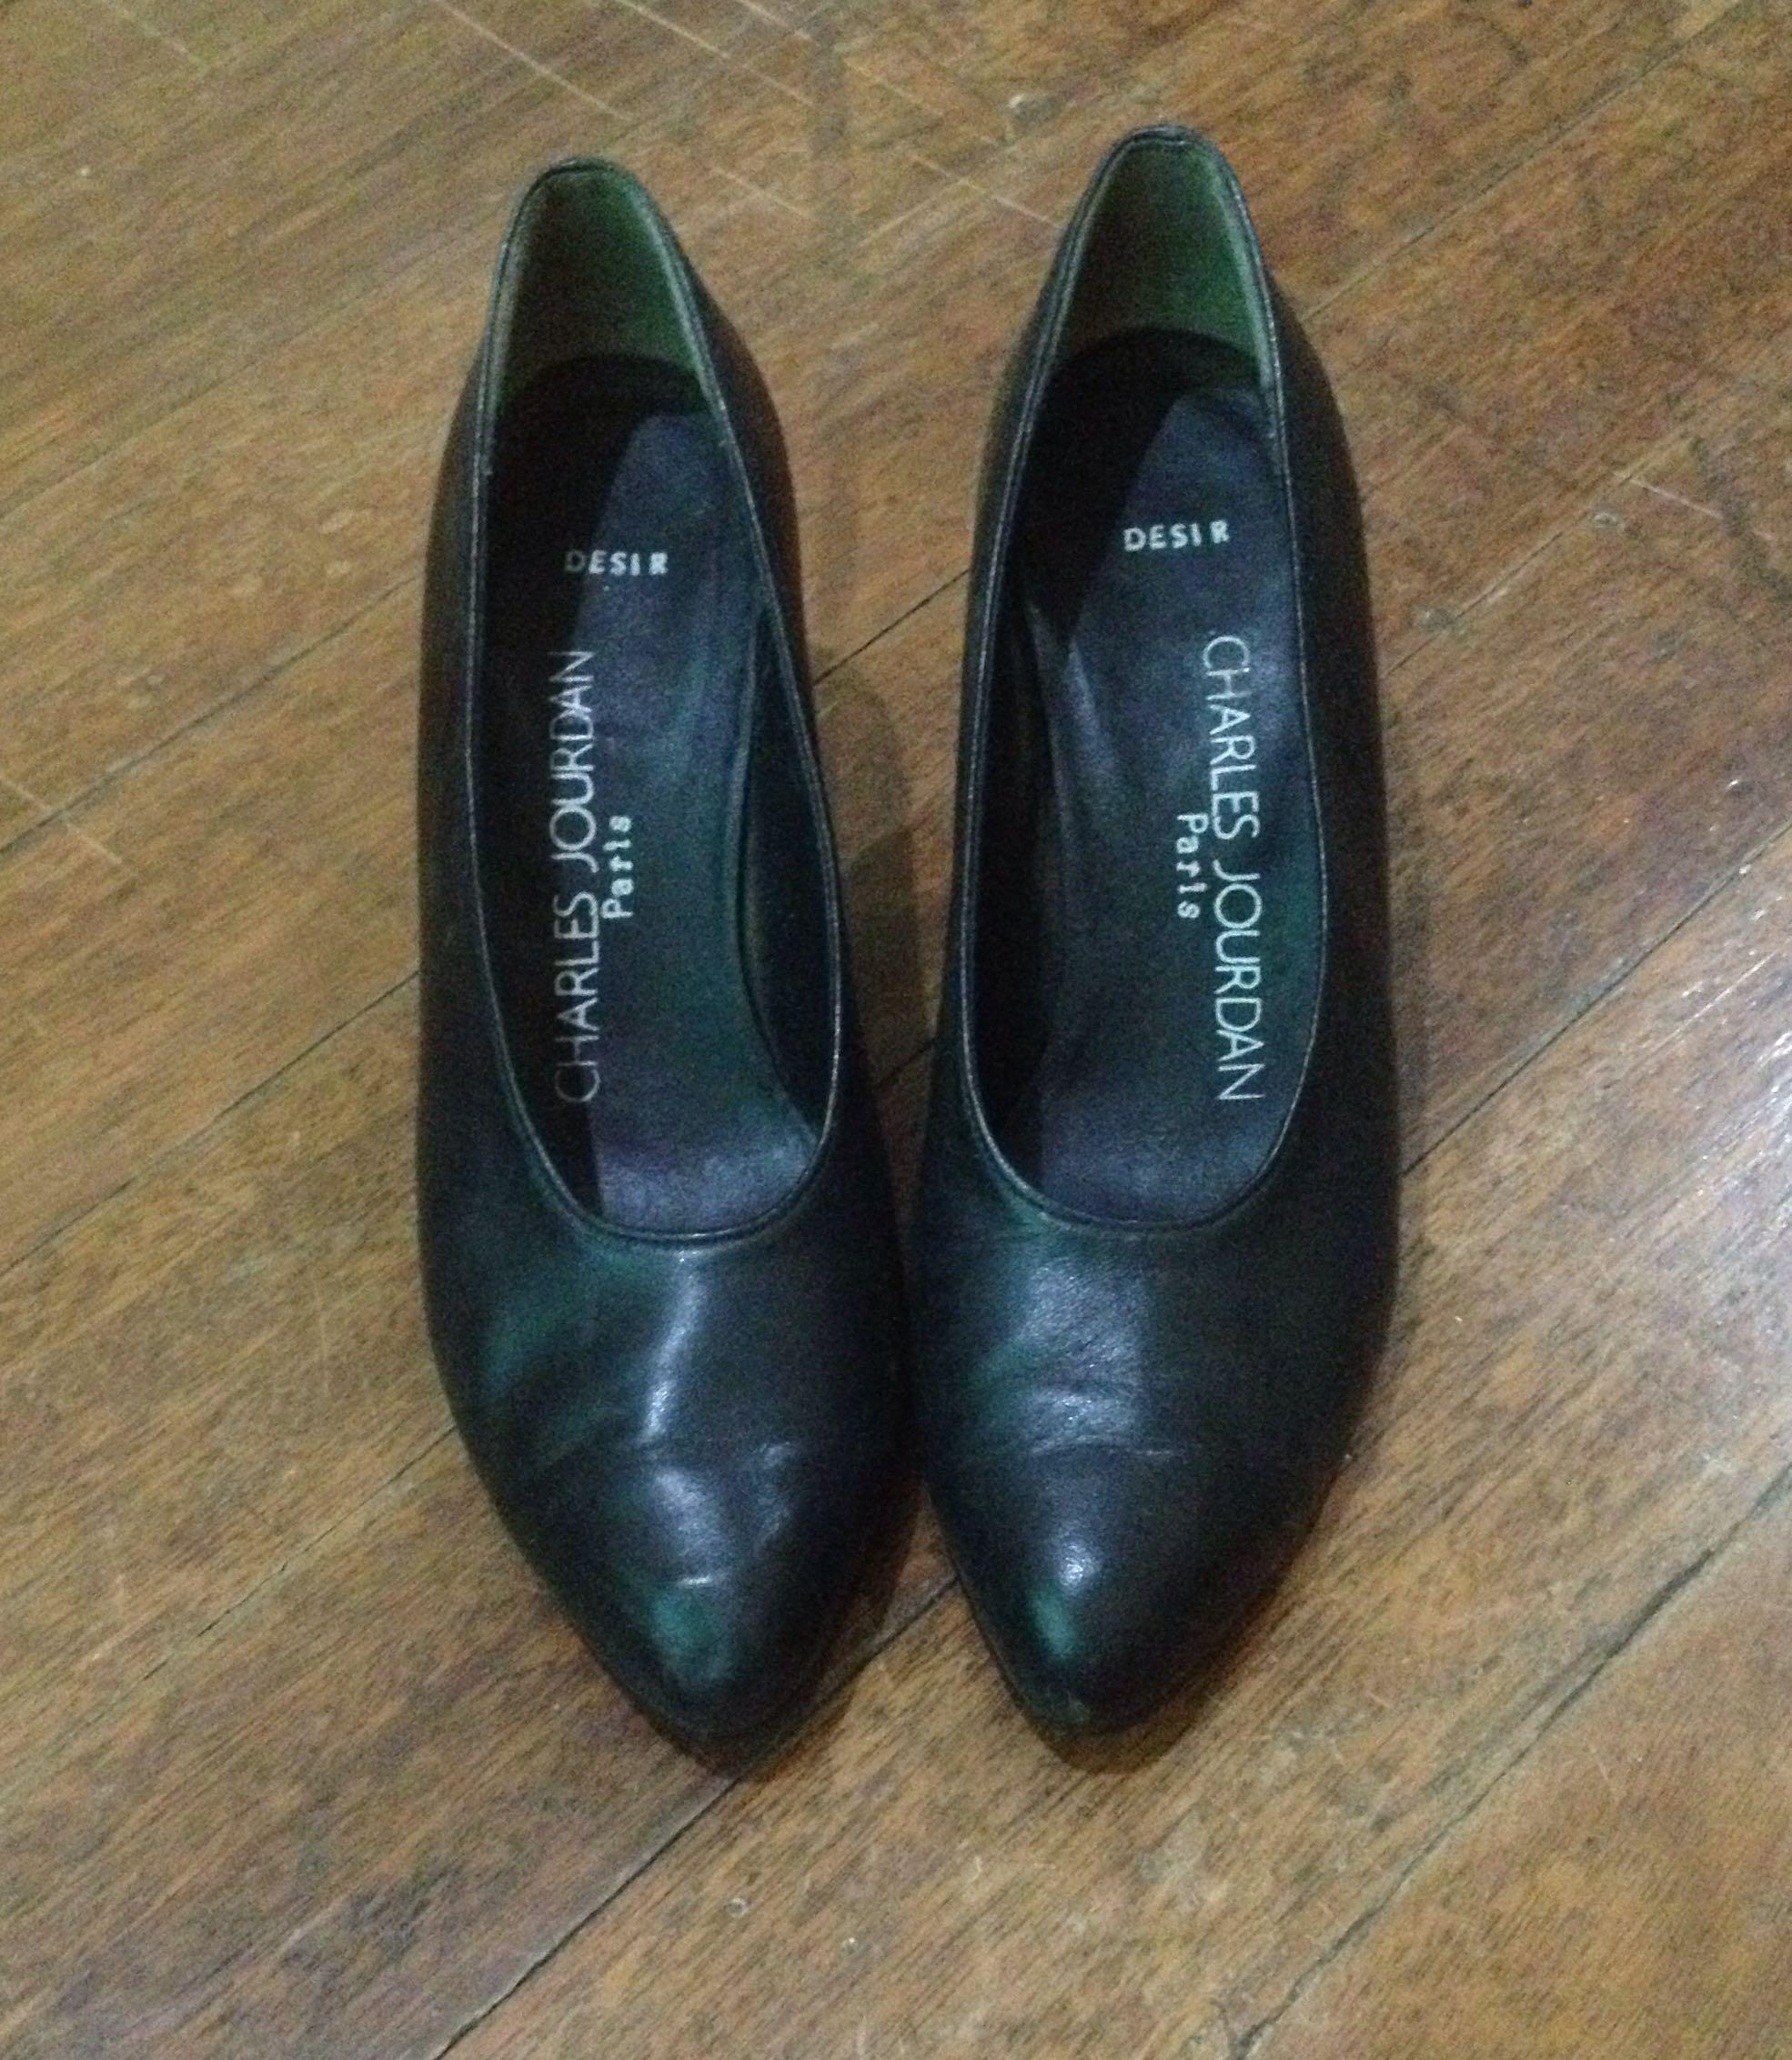 SALE! Genuine Leather Shoes by Charles Jourdan Paris